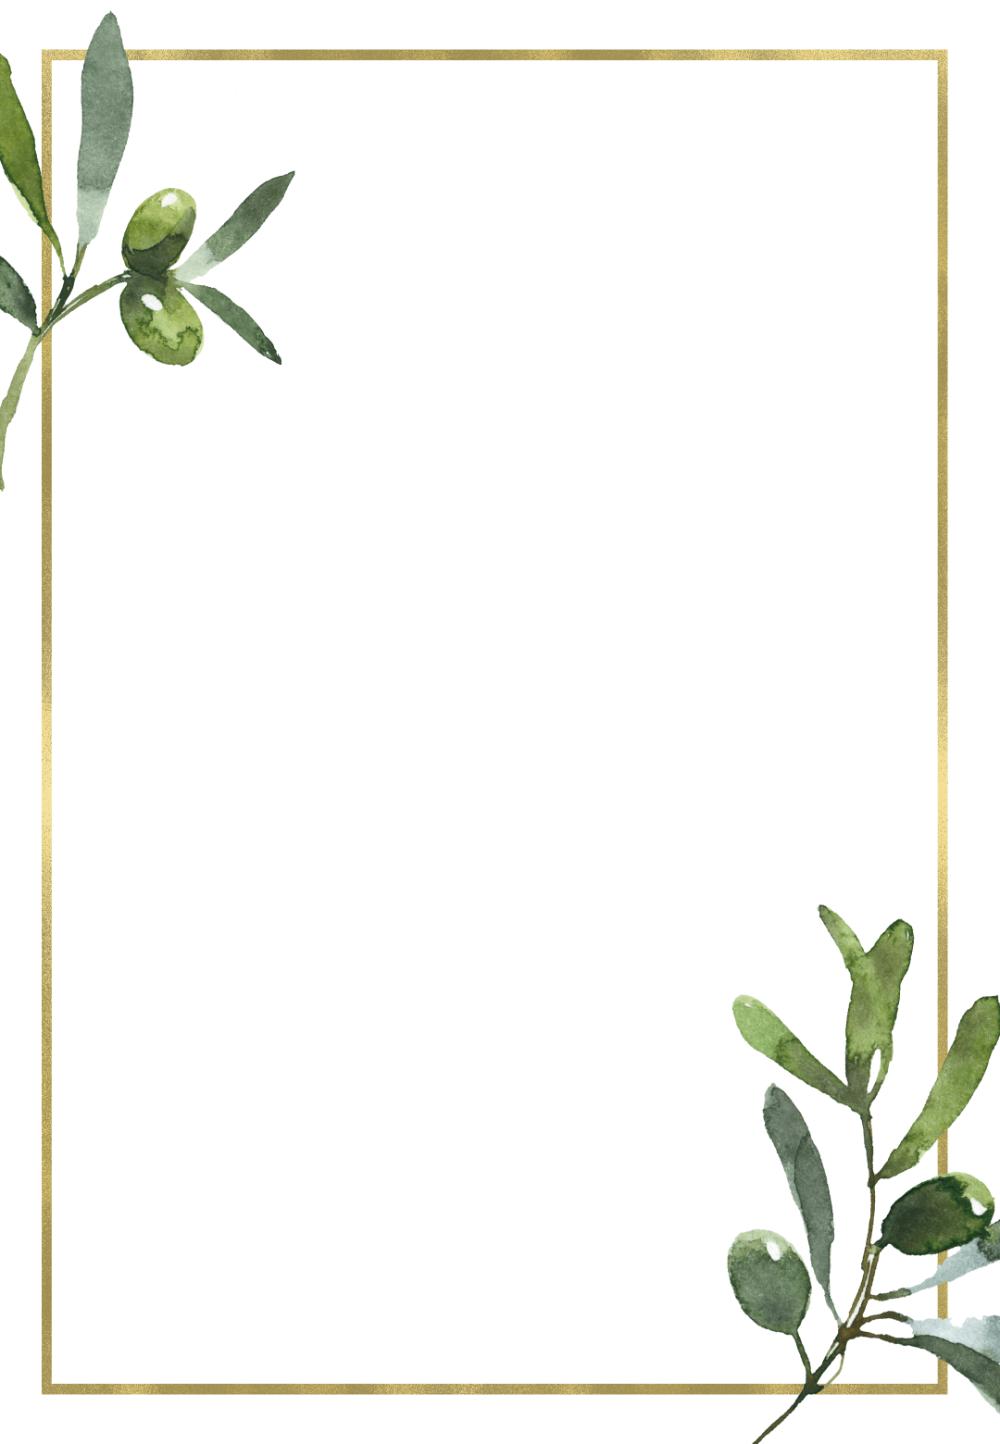 Golden Frame Olive Leaves Wedding Invitation Template Free Em 2020 Modelo Convite De Casamento Convite De Casamento Casamento